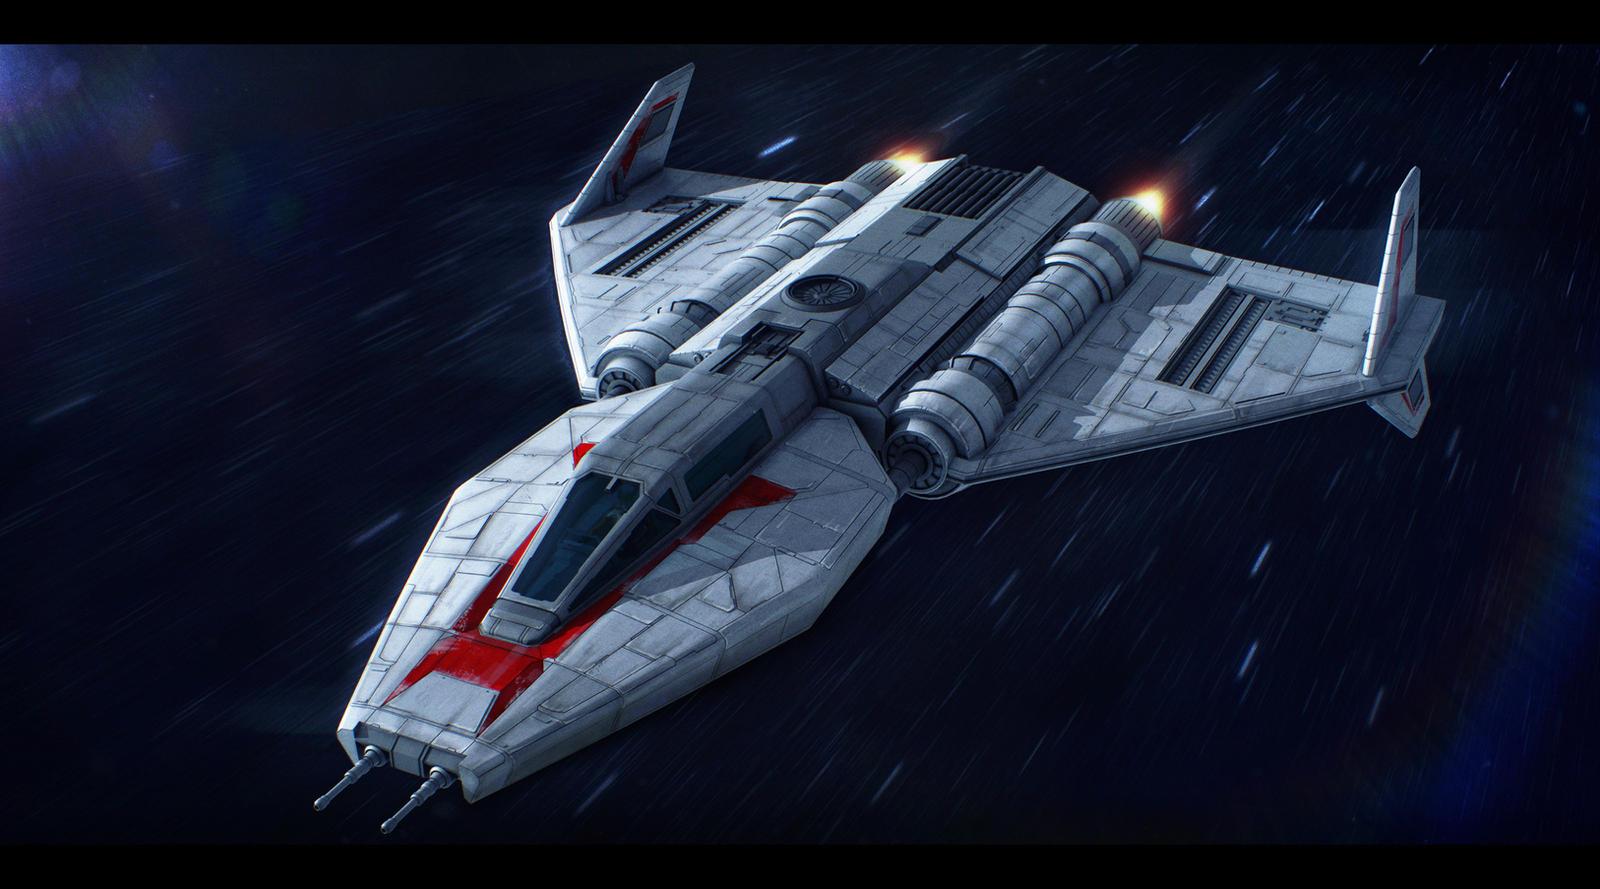 star_wars_toscan_8_q_fighter_by_adamkop-da5q2o9 X Wing Schematics on y-wing schematics, a wing fighter schematics, tie interceptor schematics, minecraft schematics, halo warthog schematics, b-wing schematics, at-at schematics,